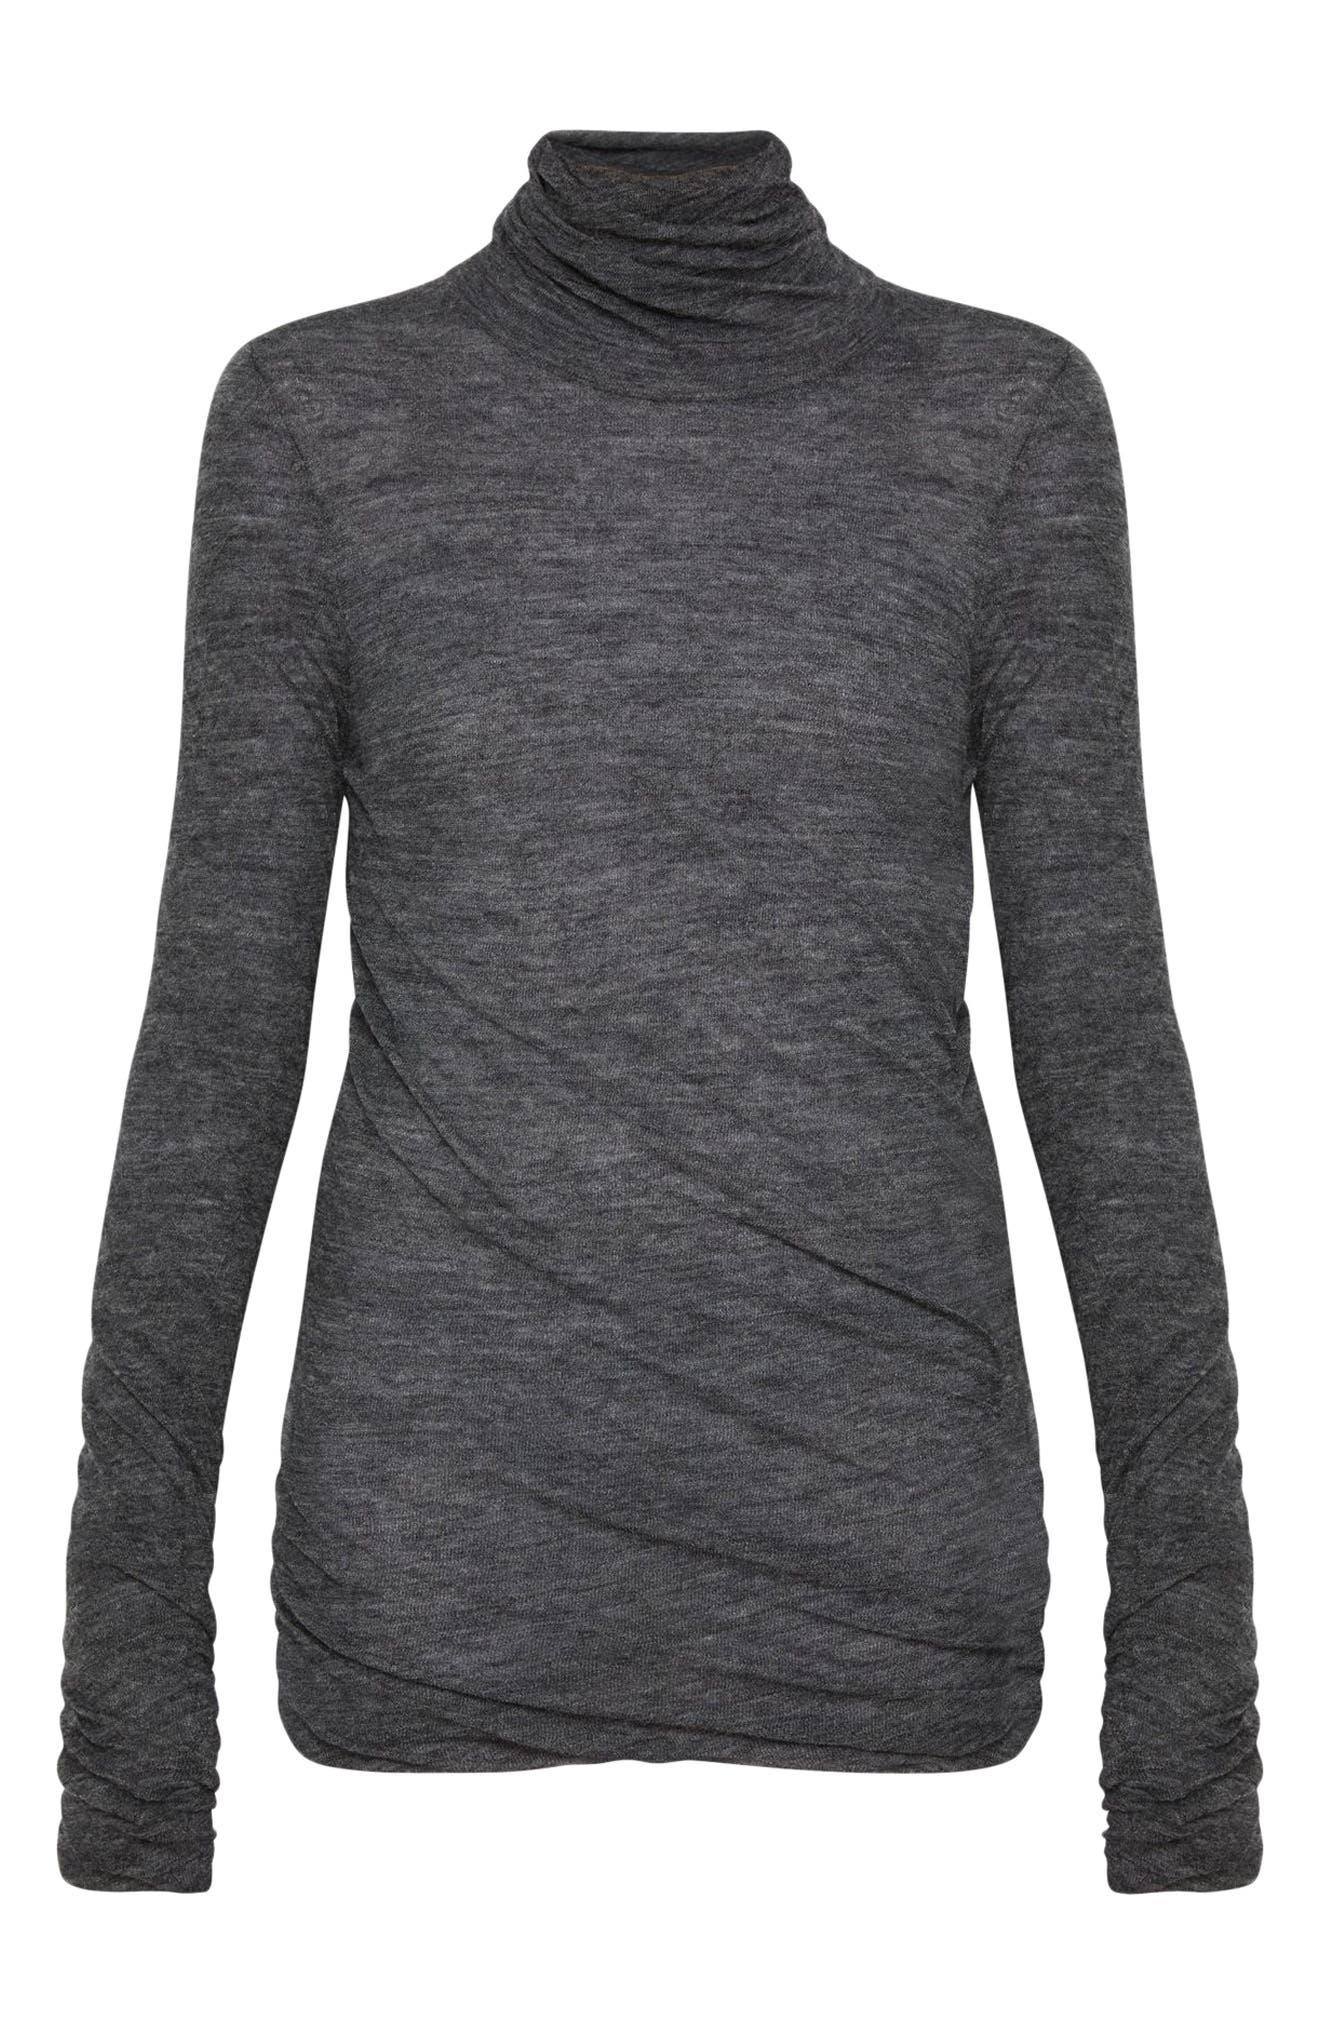 Twist Turtleneck Sweater,                             Alternate thumbnail 4, color,                             030